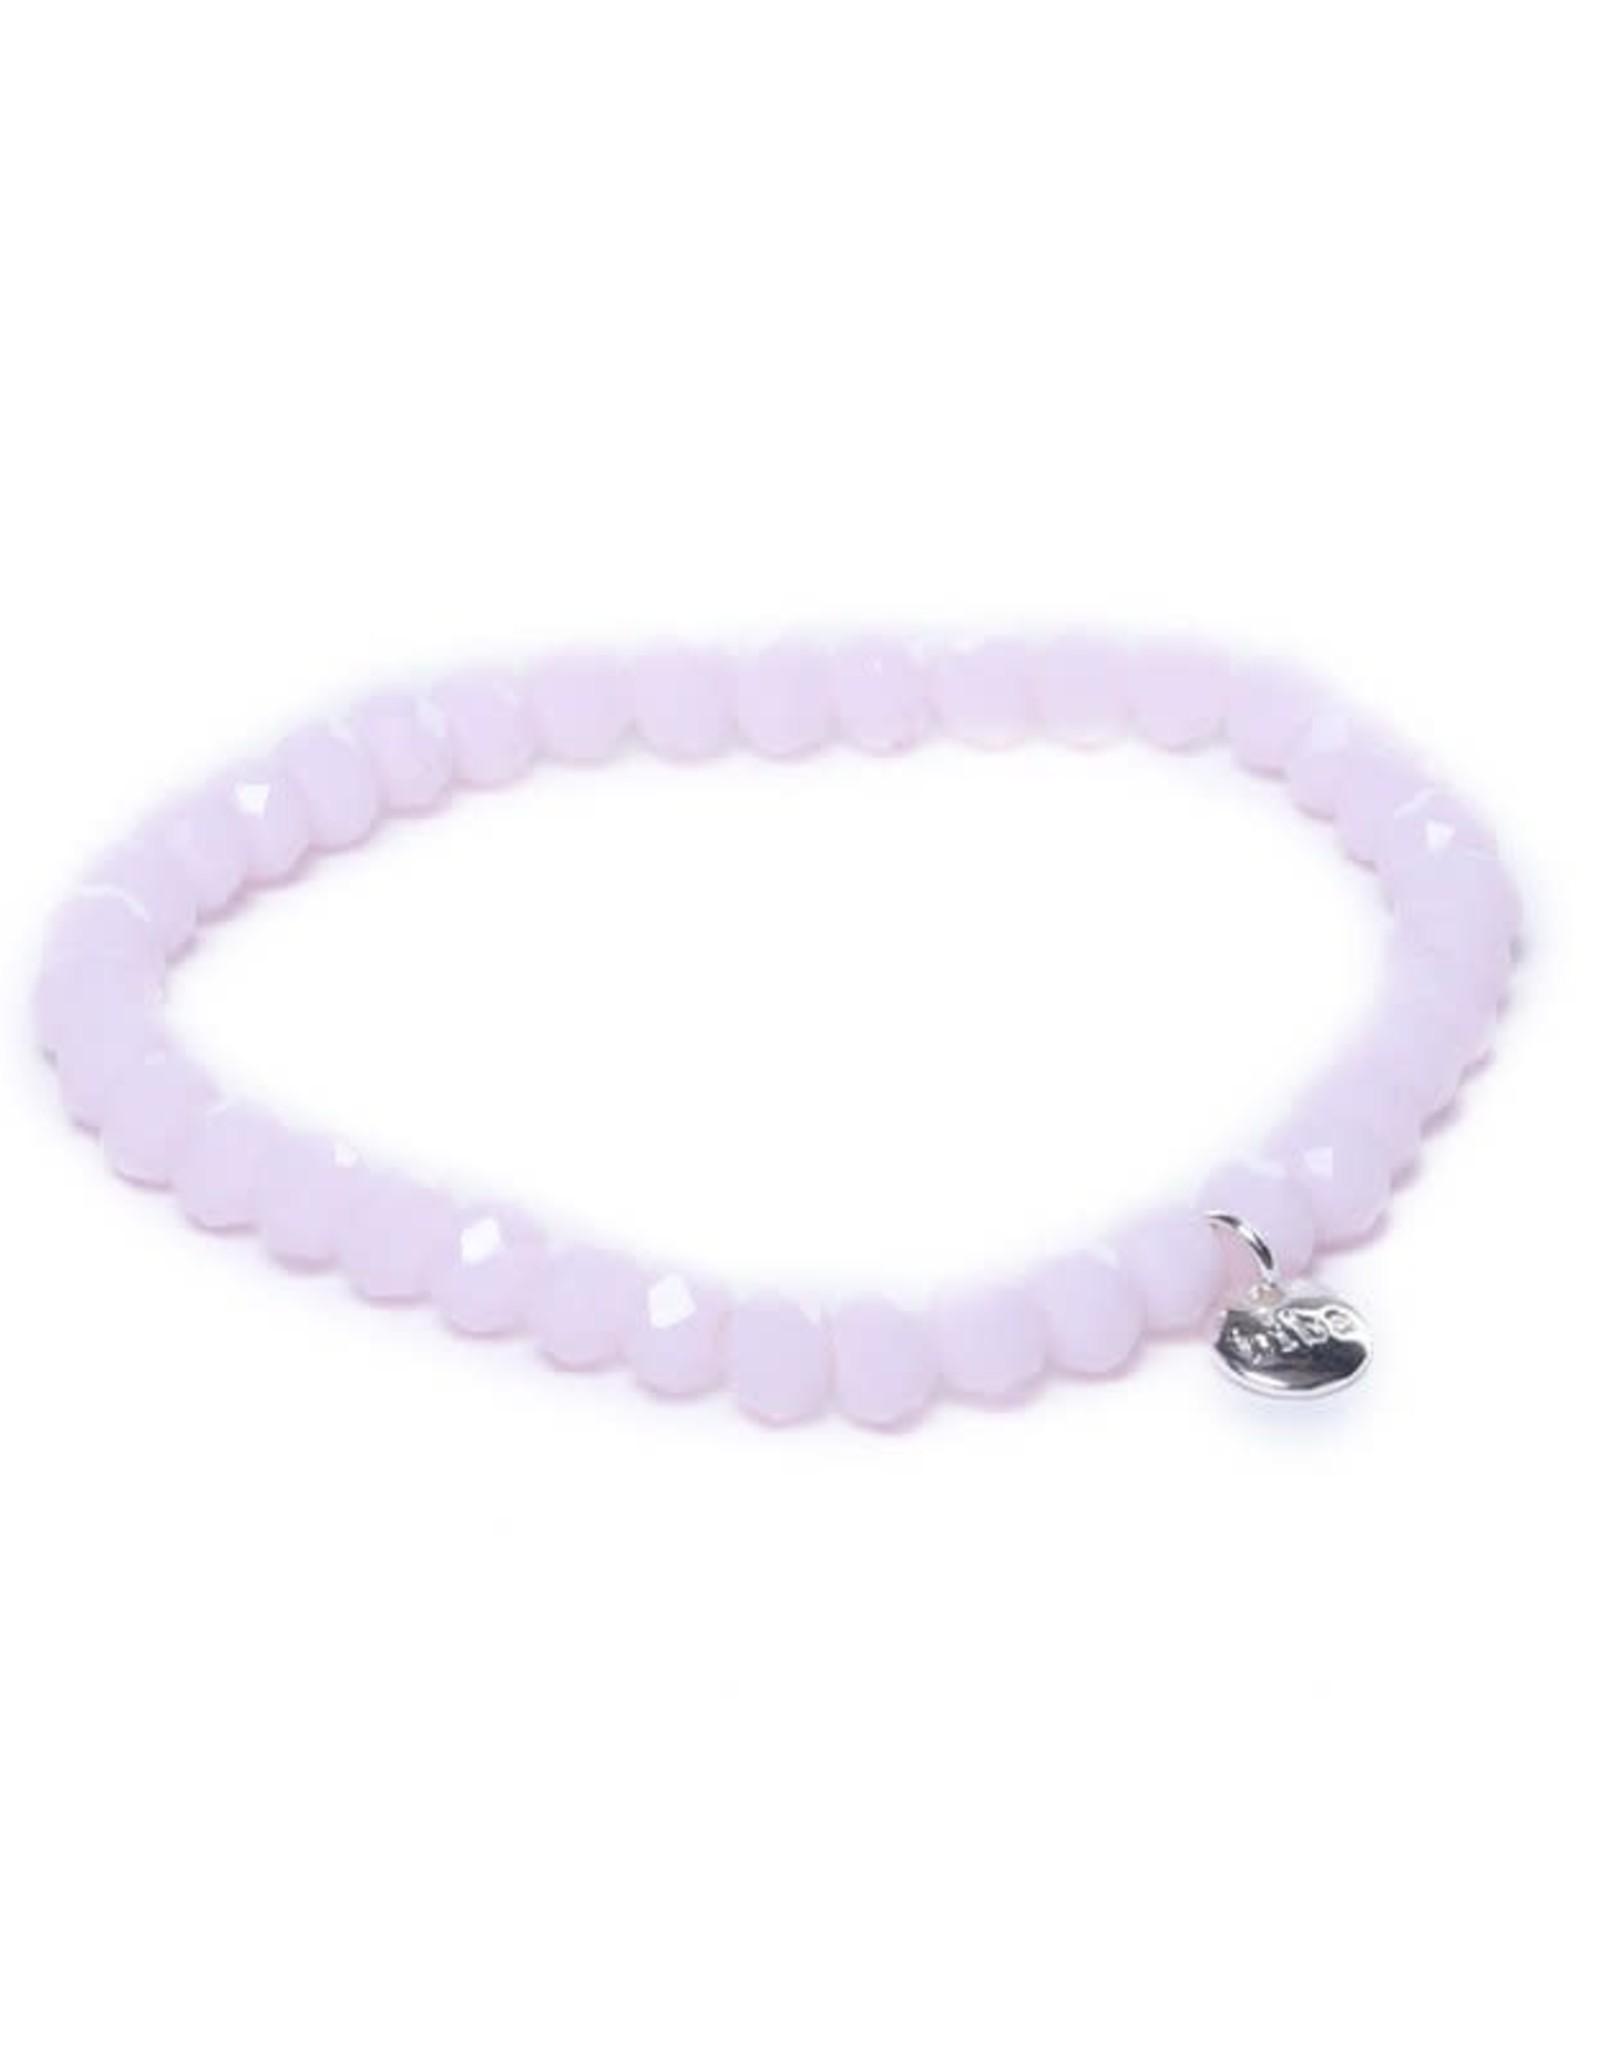 Biba Biba armband crystal licht roze 6mm